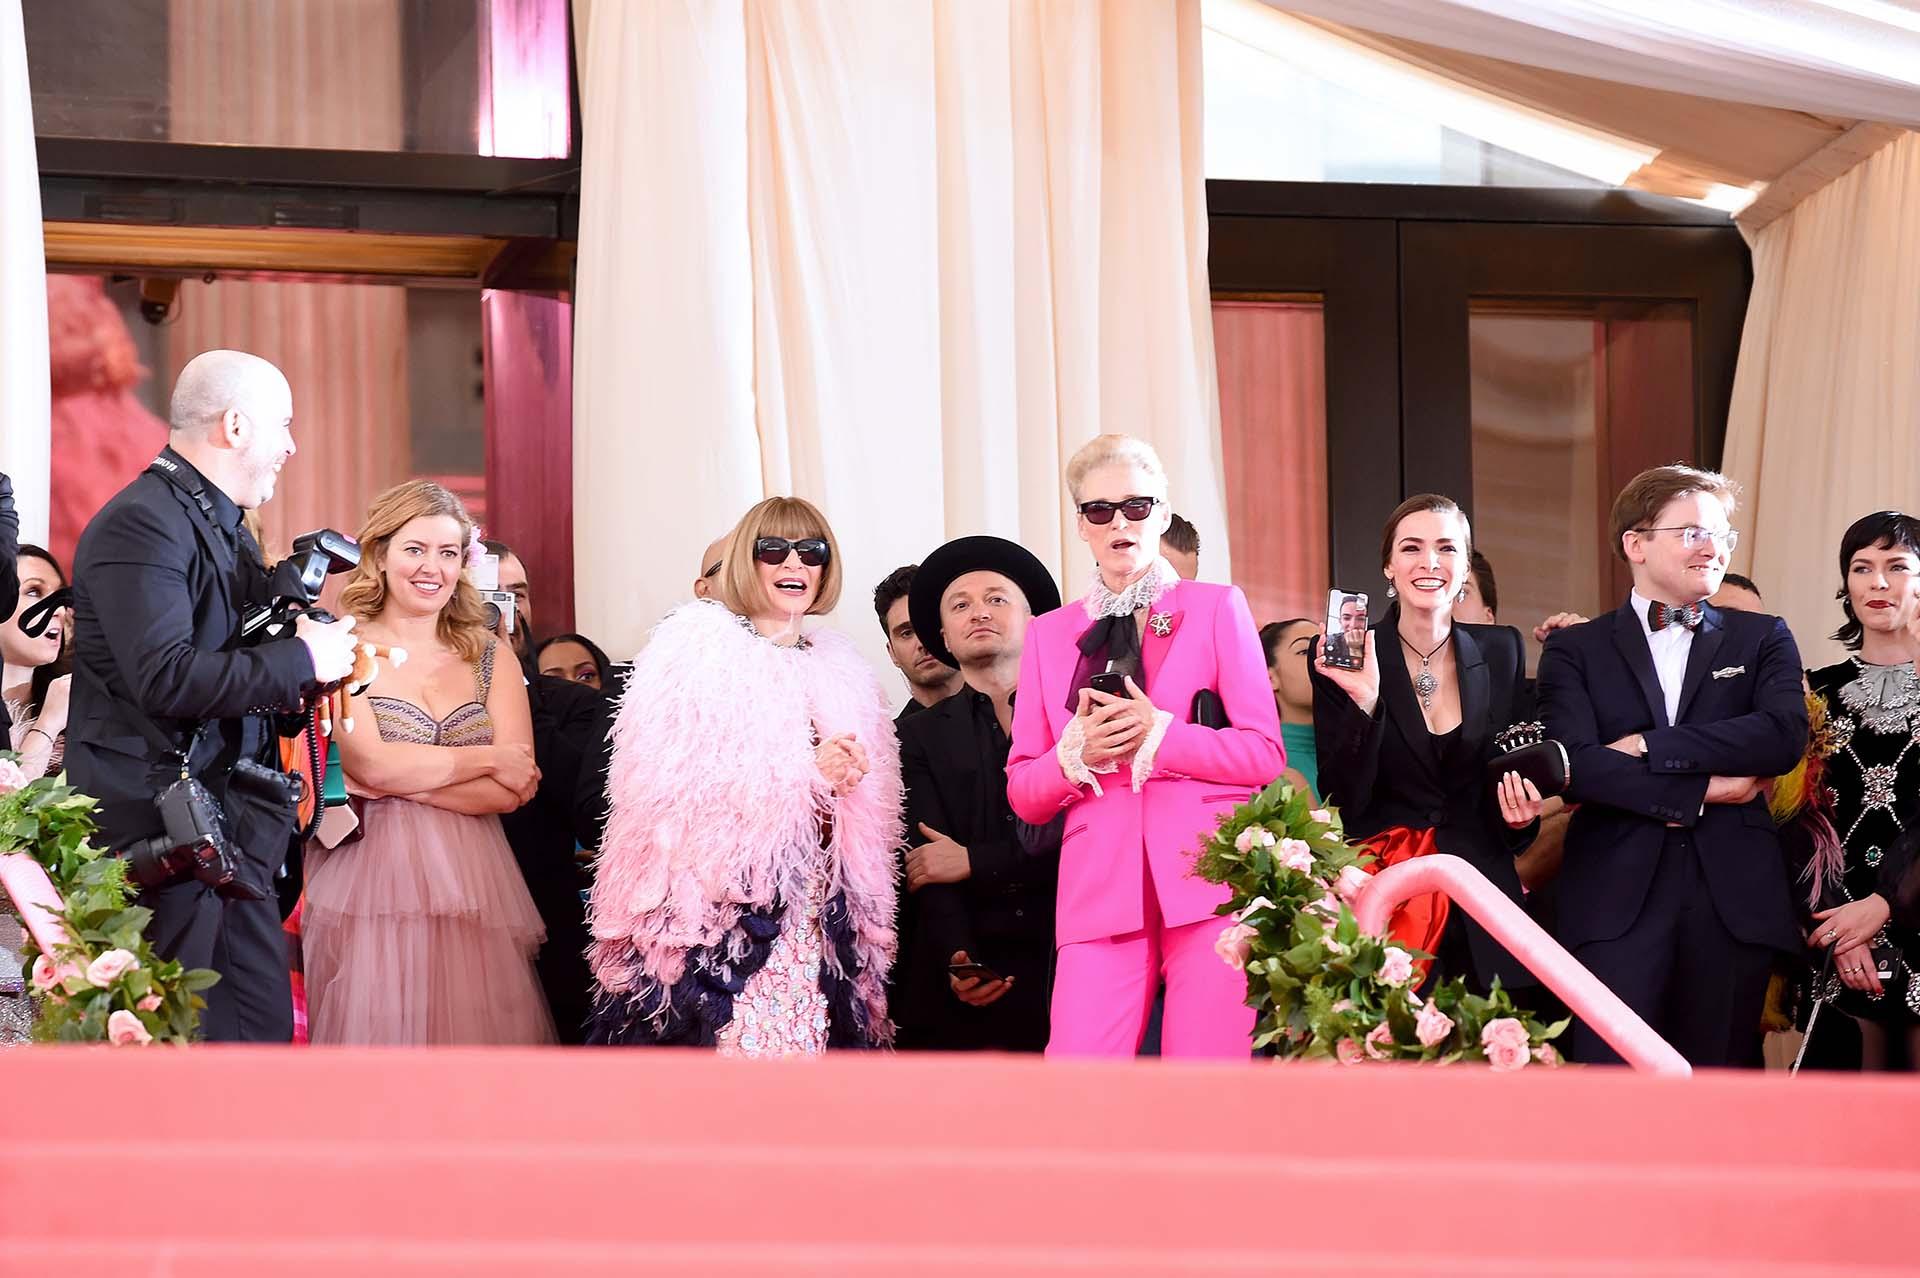 Anna Wintour y Lisa Love atónitas ante la presentación de Gaga